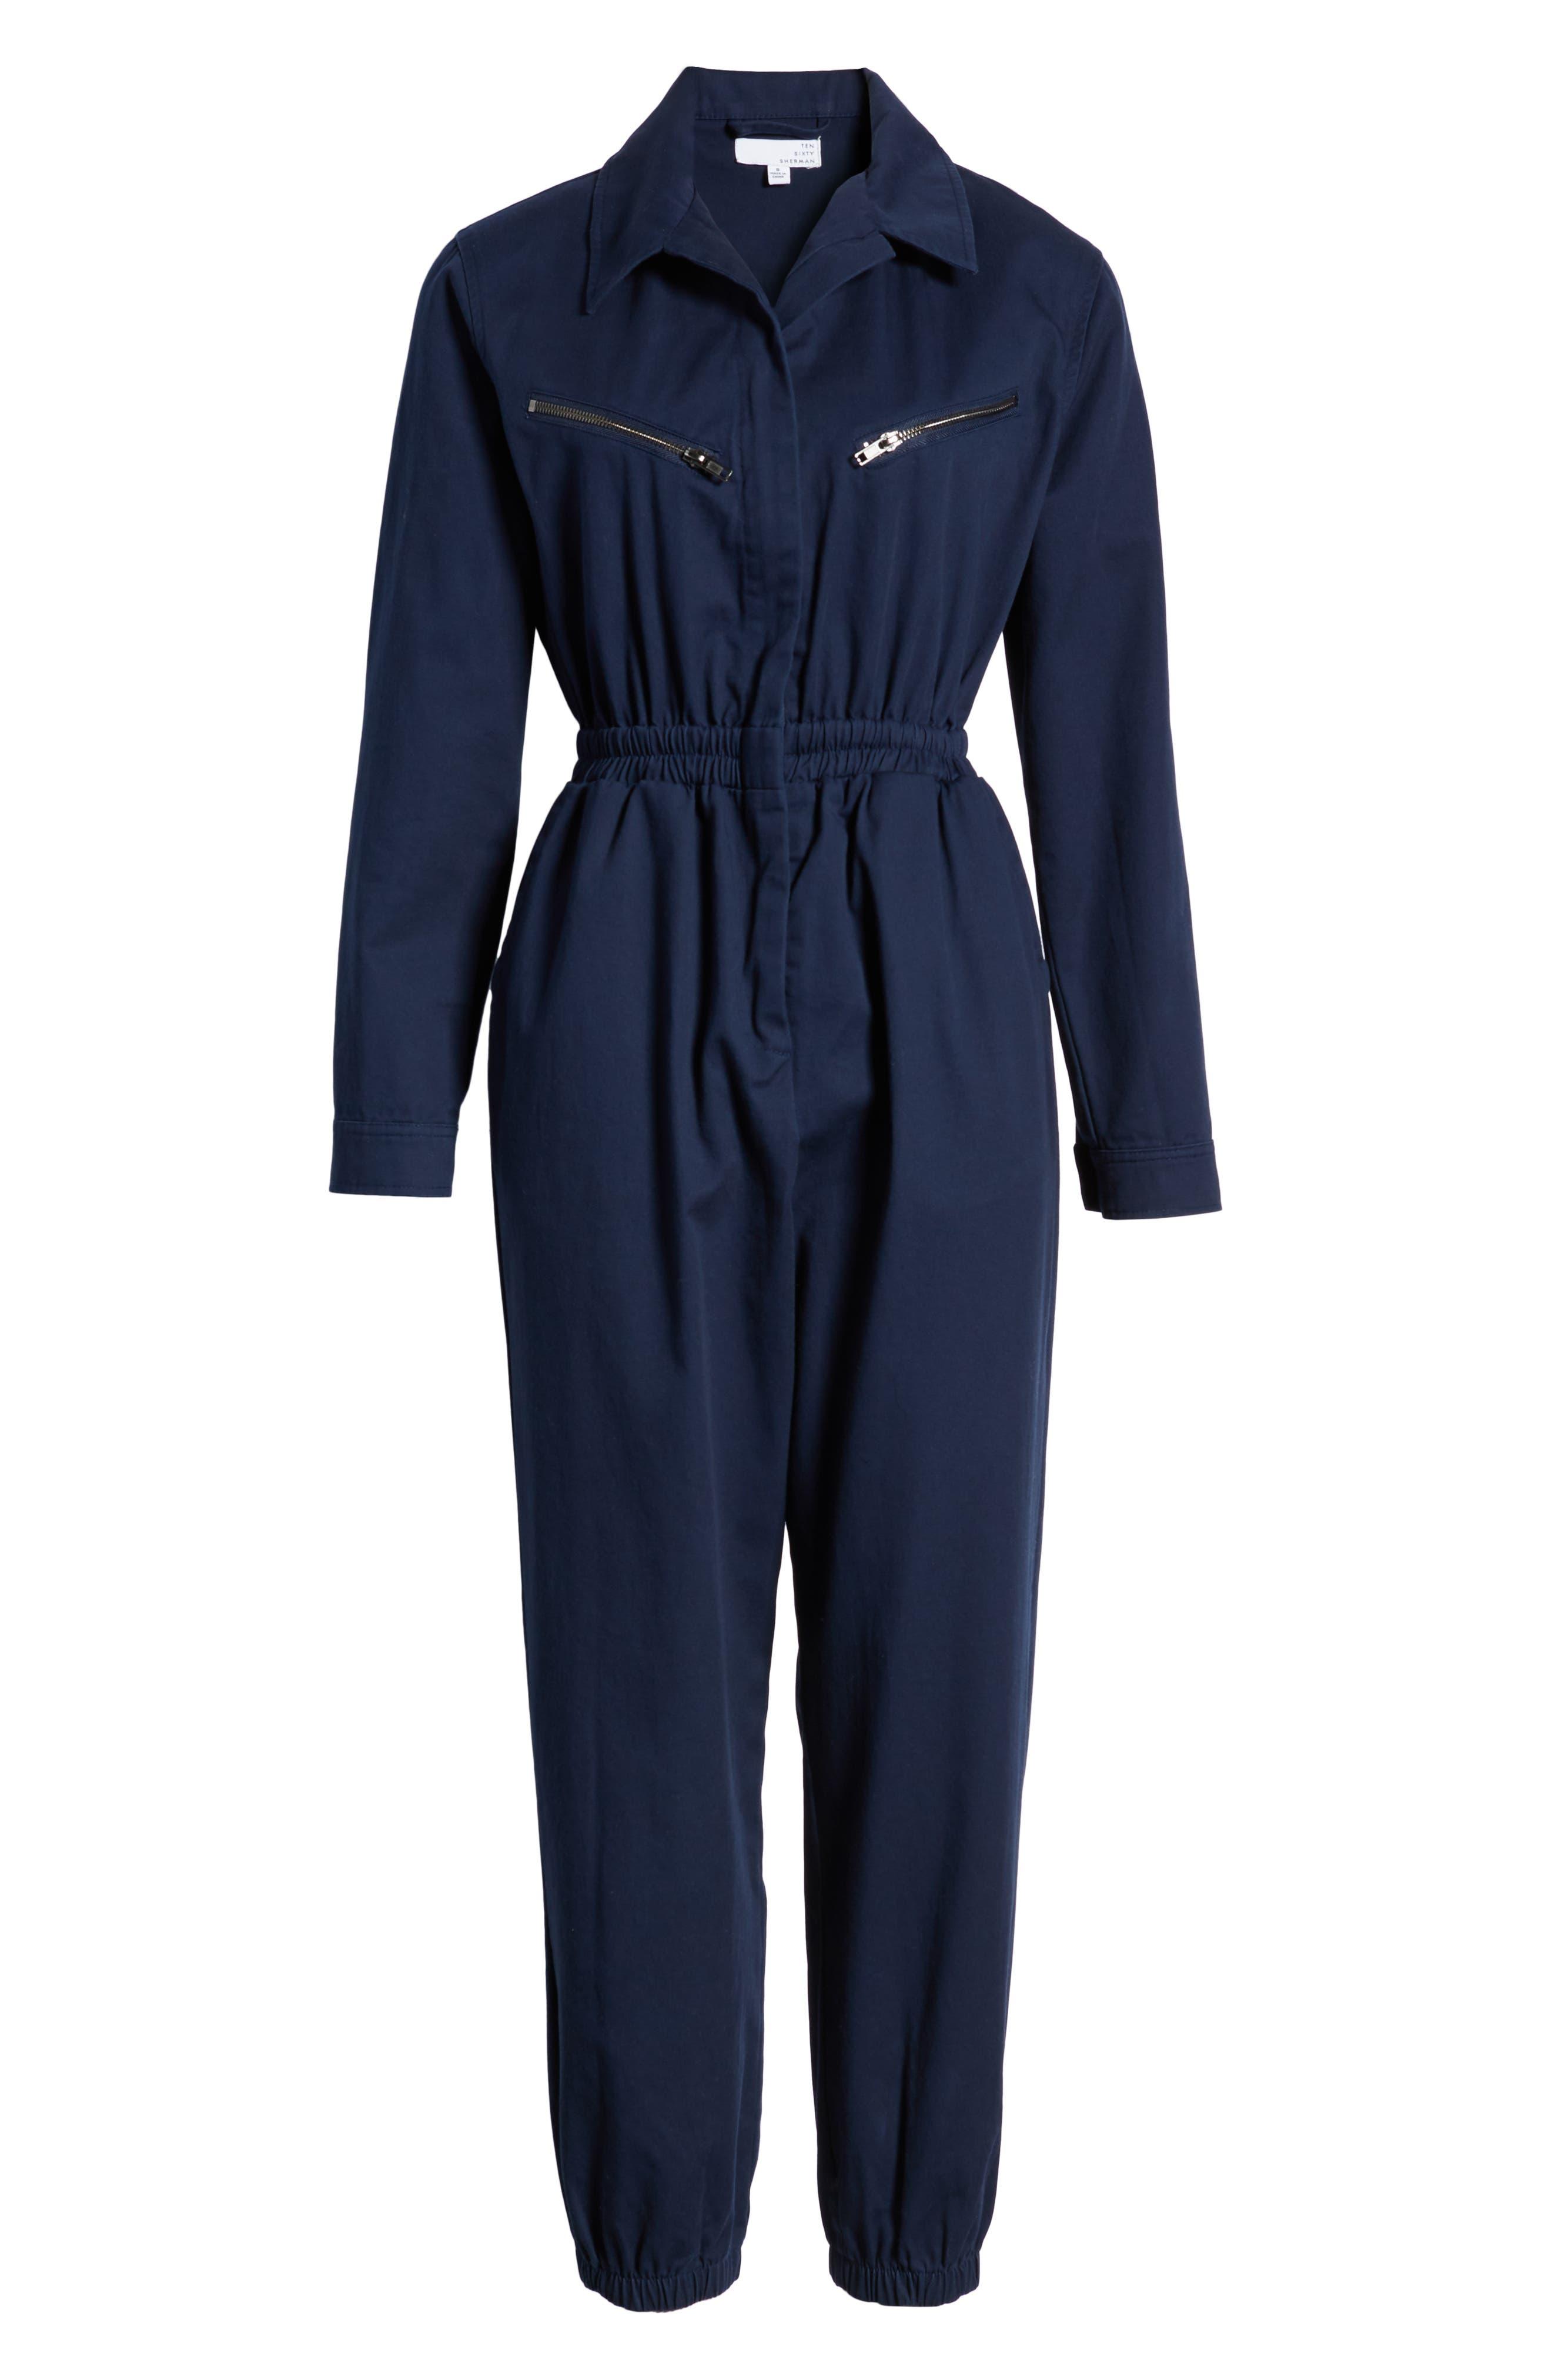 TEN SIXTY SHERMAN,                             Twill Workwear Jumpsuit,                             Alternate thumbnail 7, color,                             OXFORD BLUE